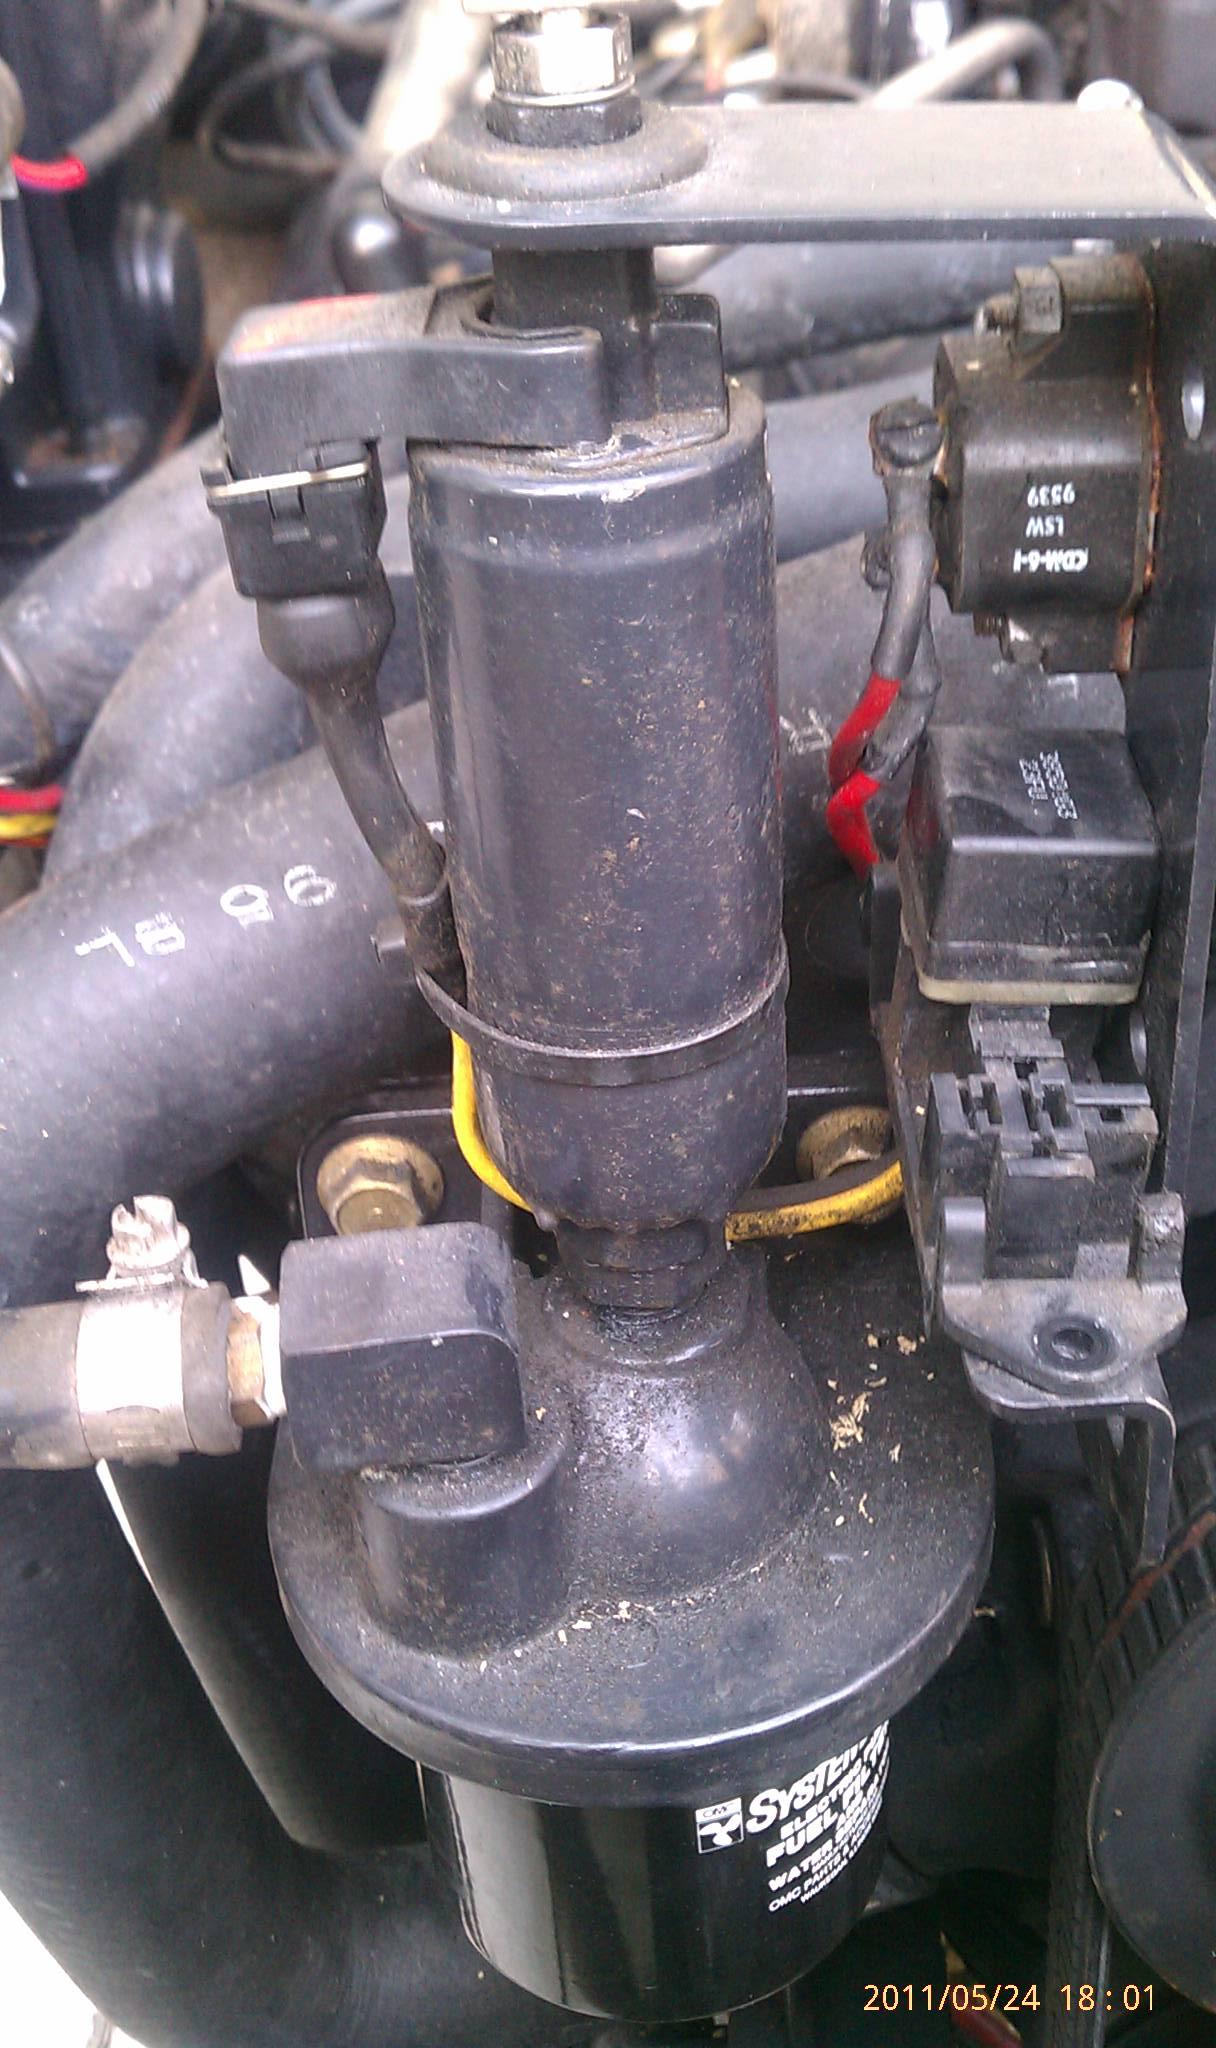 4 3 volvo penta alternator wiring diagram plug mercruiser fuel pump relay, mercruiser, free engine image for user manual download